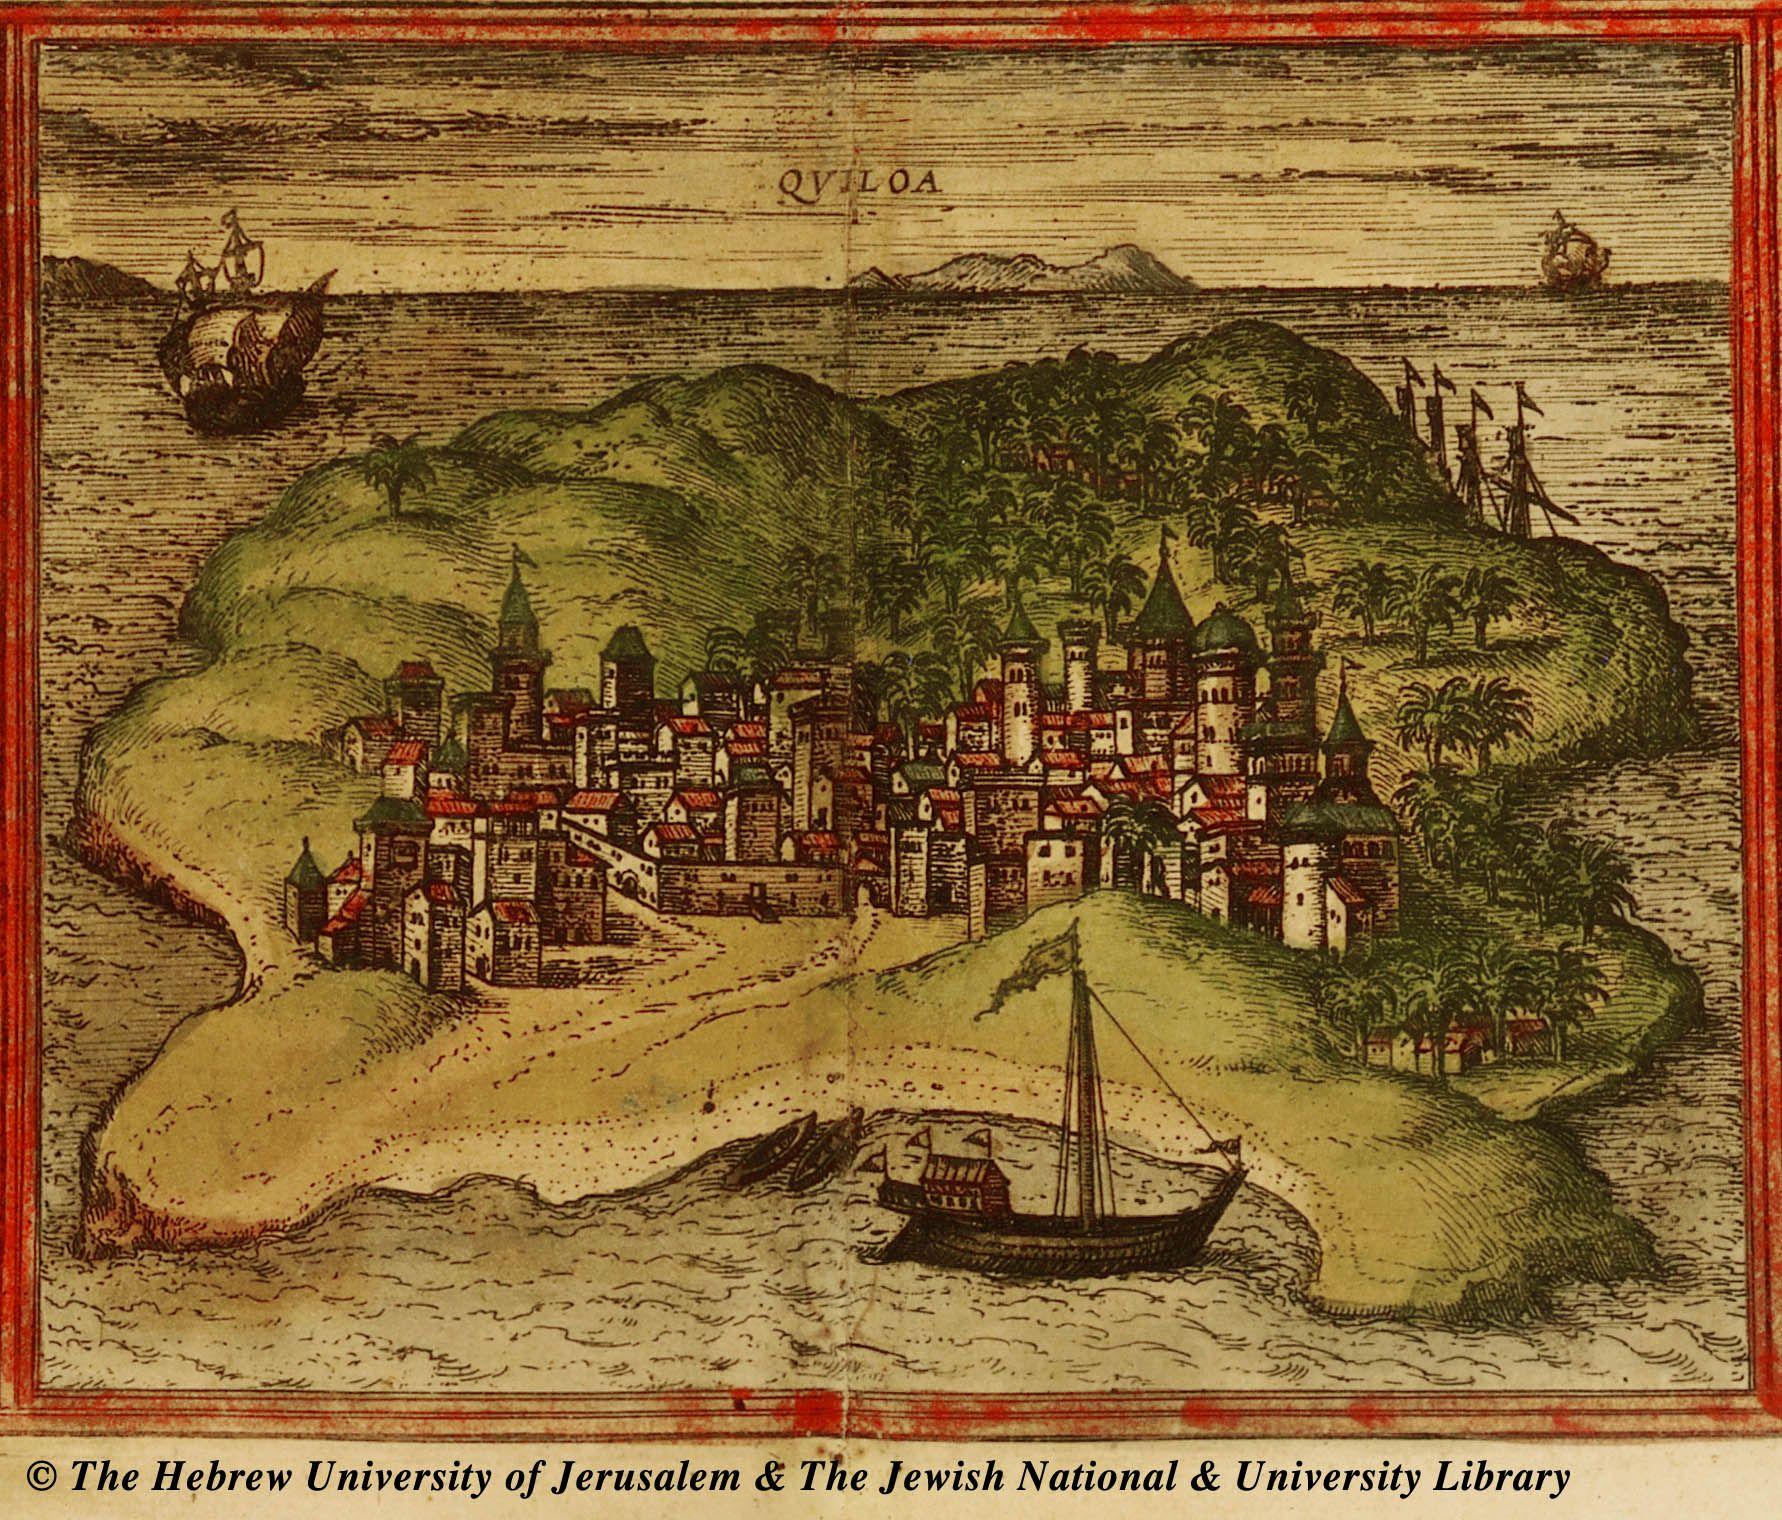 Kilwa Kisiwani (Quiloa) - undated Portugueuse map, published in Civitates Orbis Terrarum in 1572